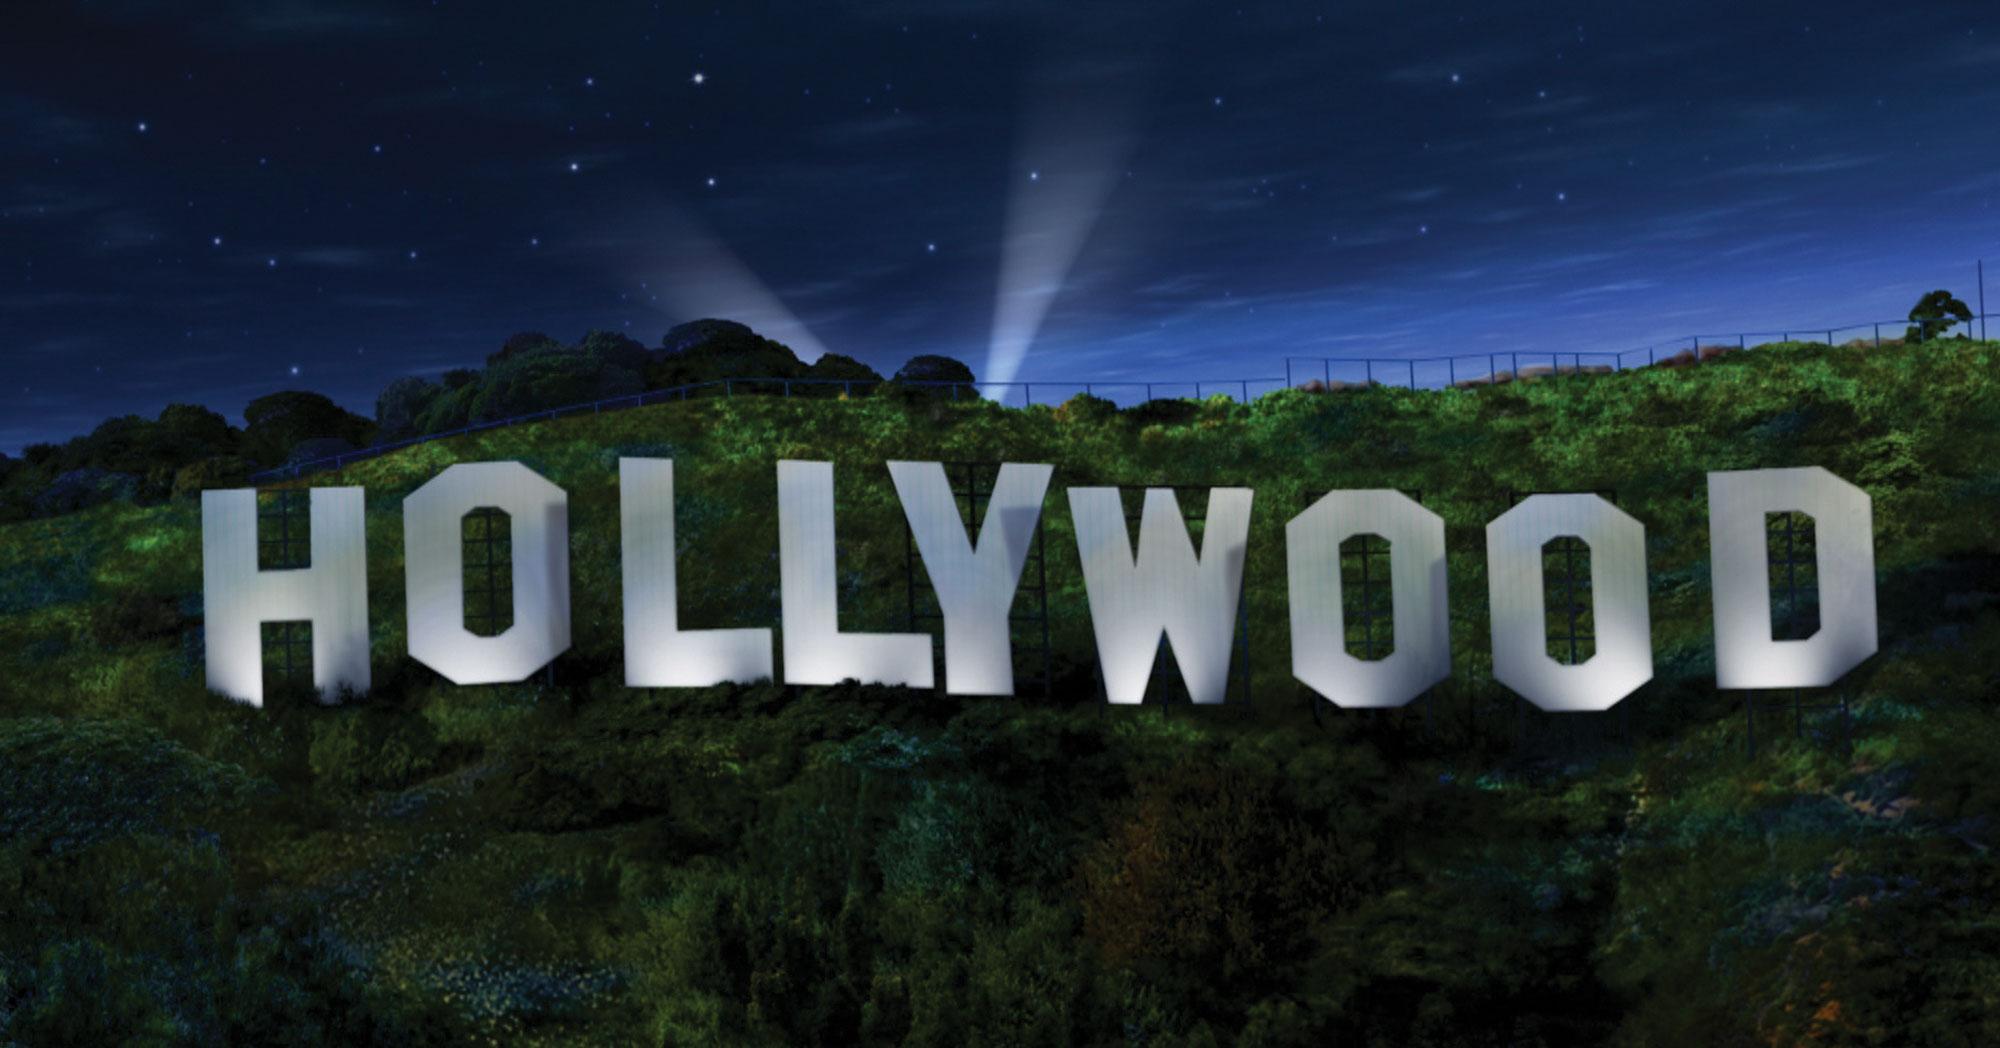 stockton symphony presents pops 3 hollywood hit parade events